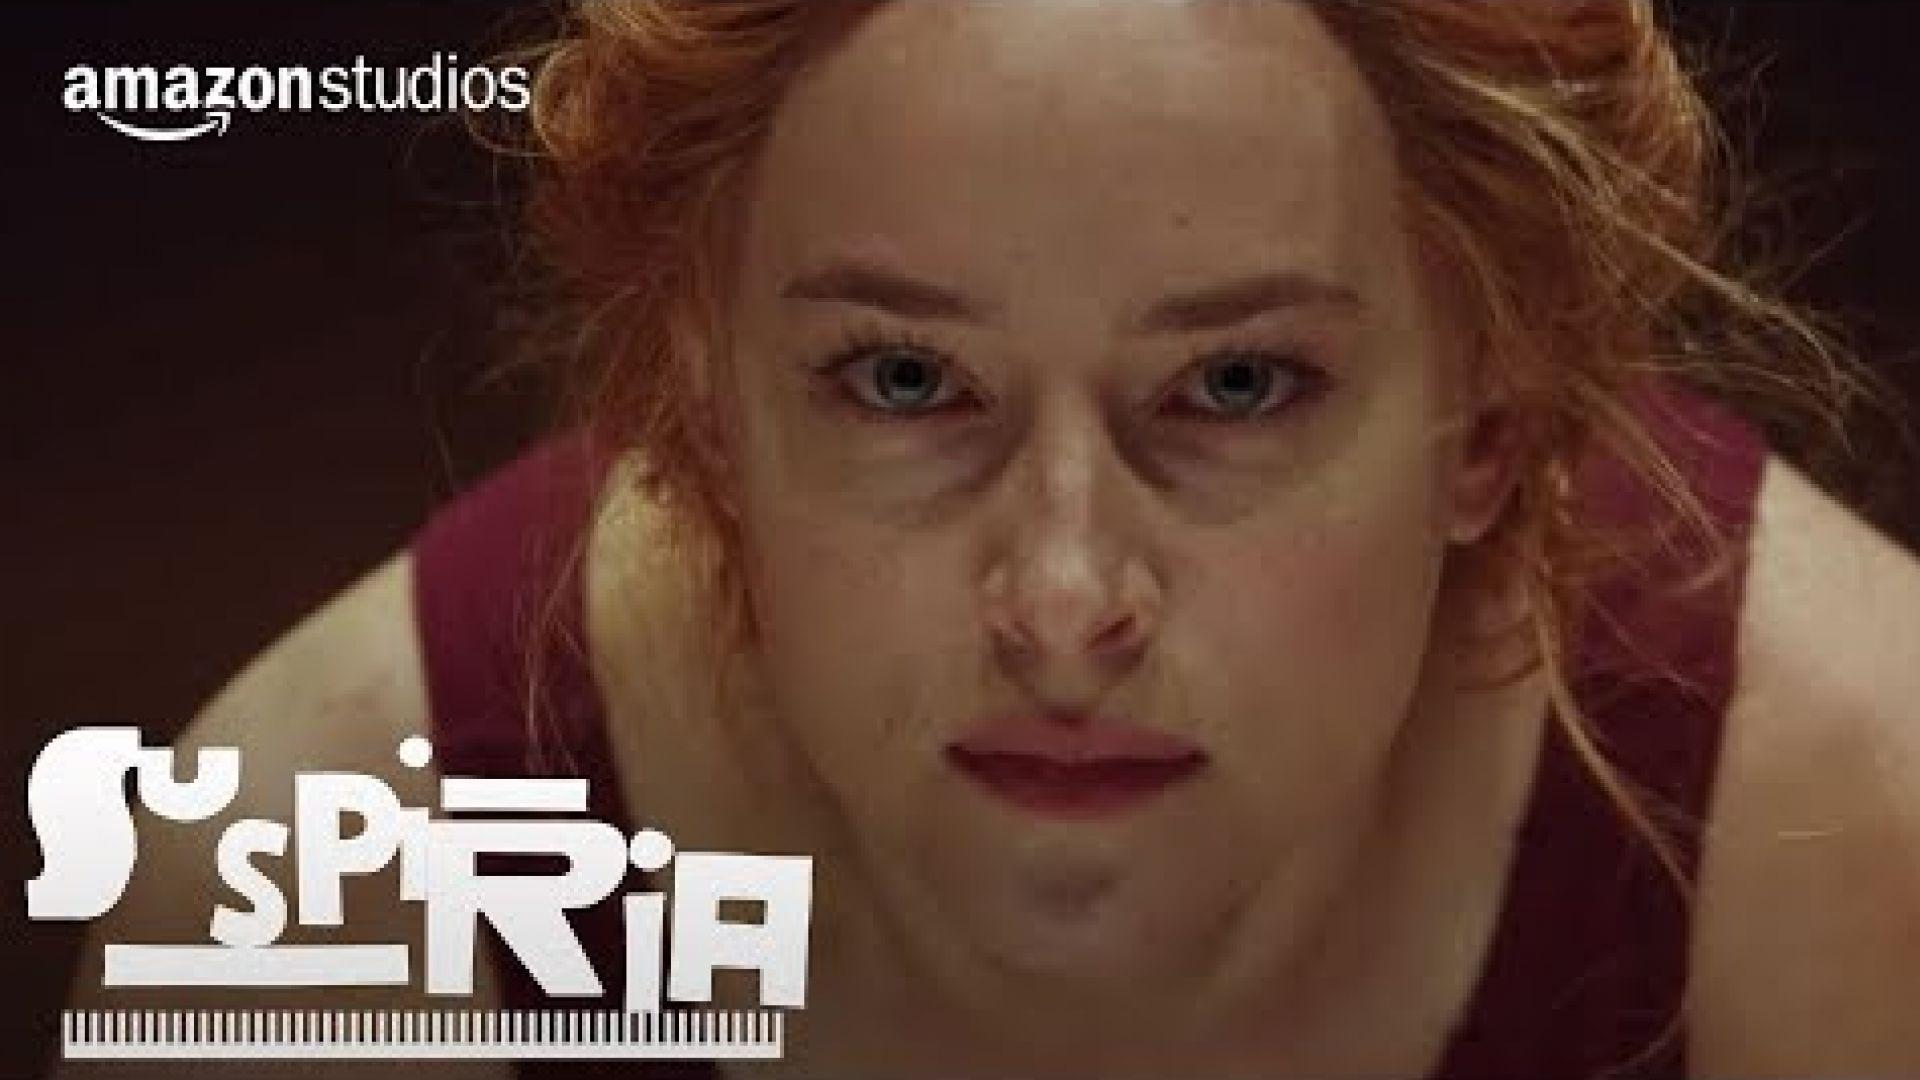 'Suspiria' Teaser Trailer - Amazon Studios